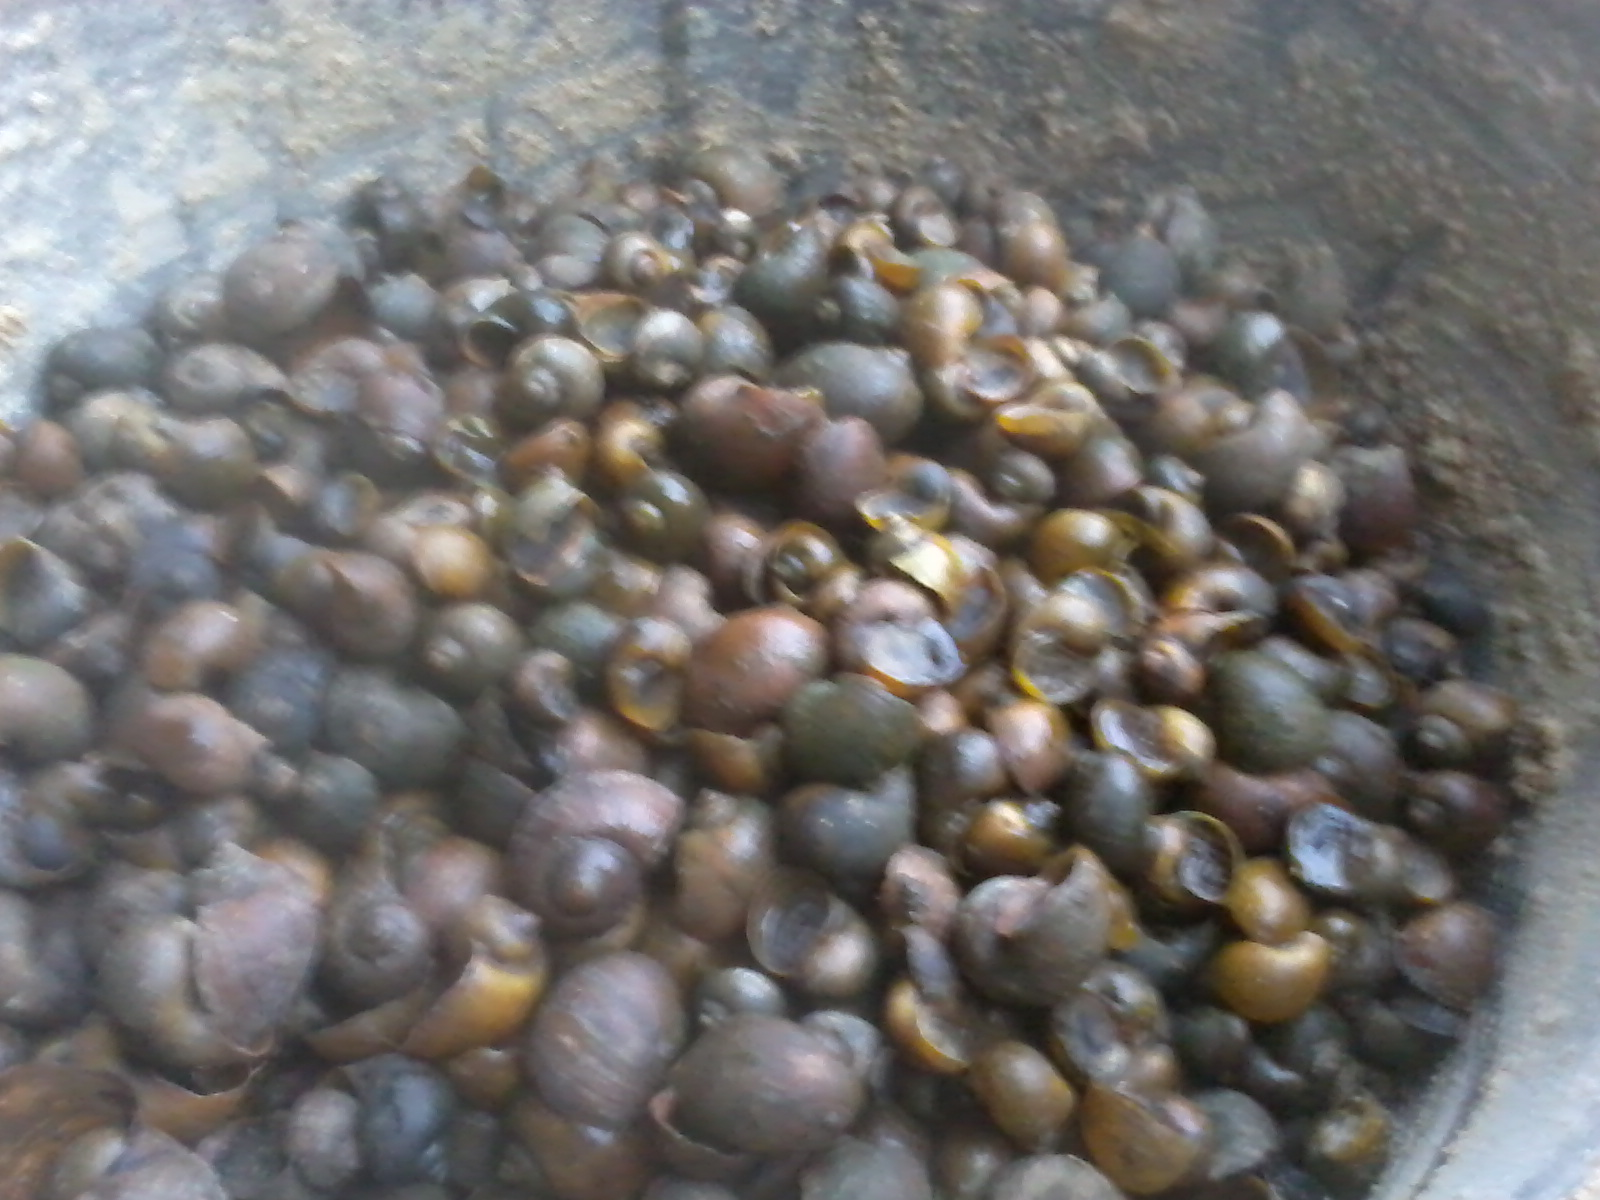 Mengenal Jenis Pakan Ternak Bebek Petelur Agar Meningkatkan Produktivitas Telurnya